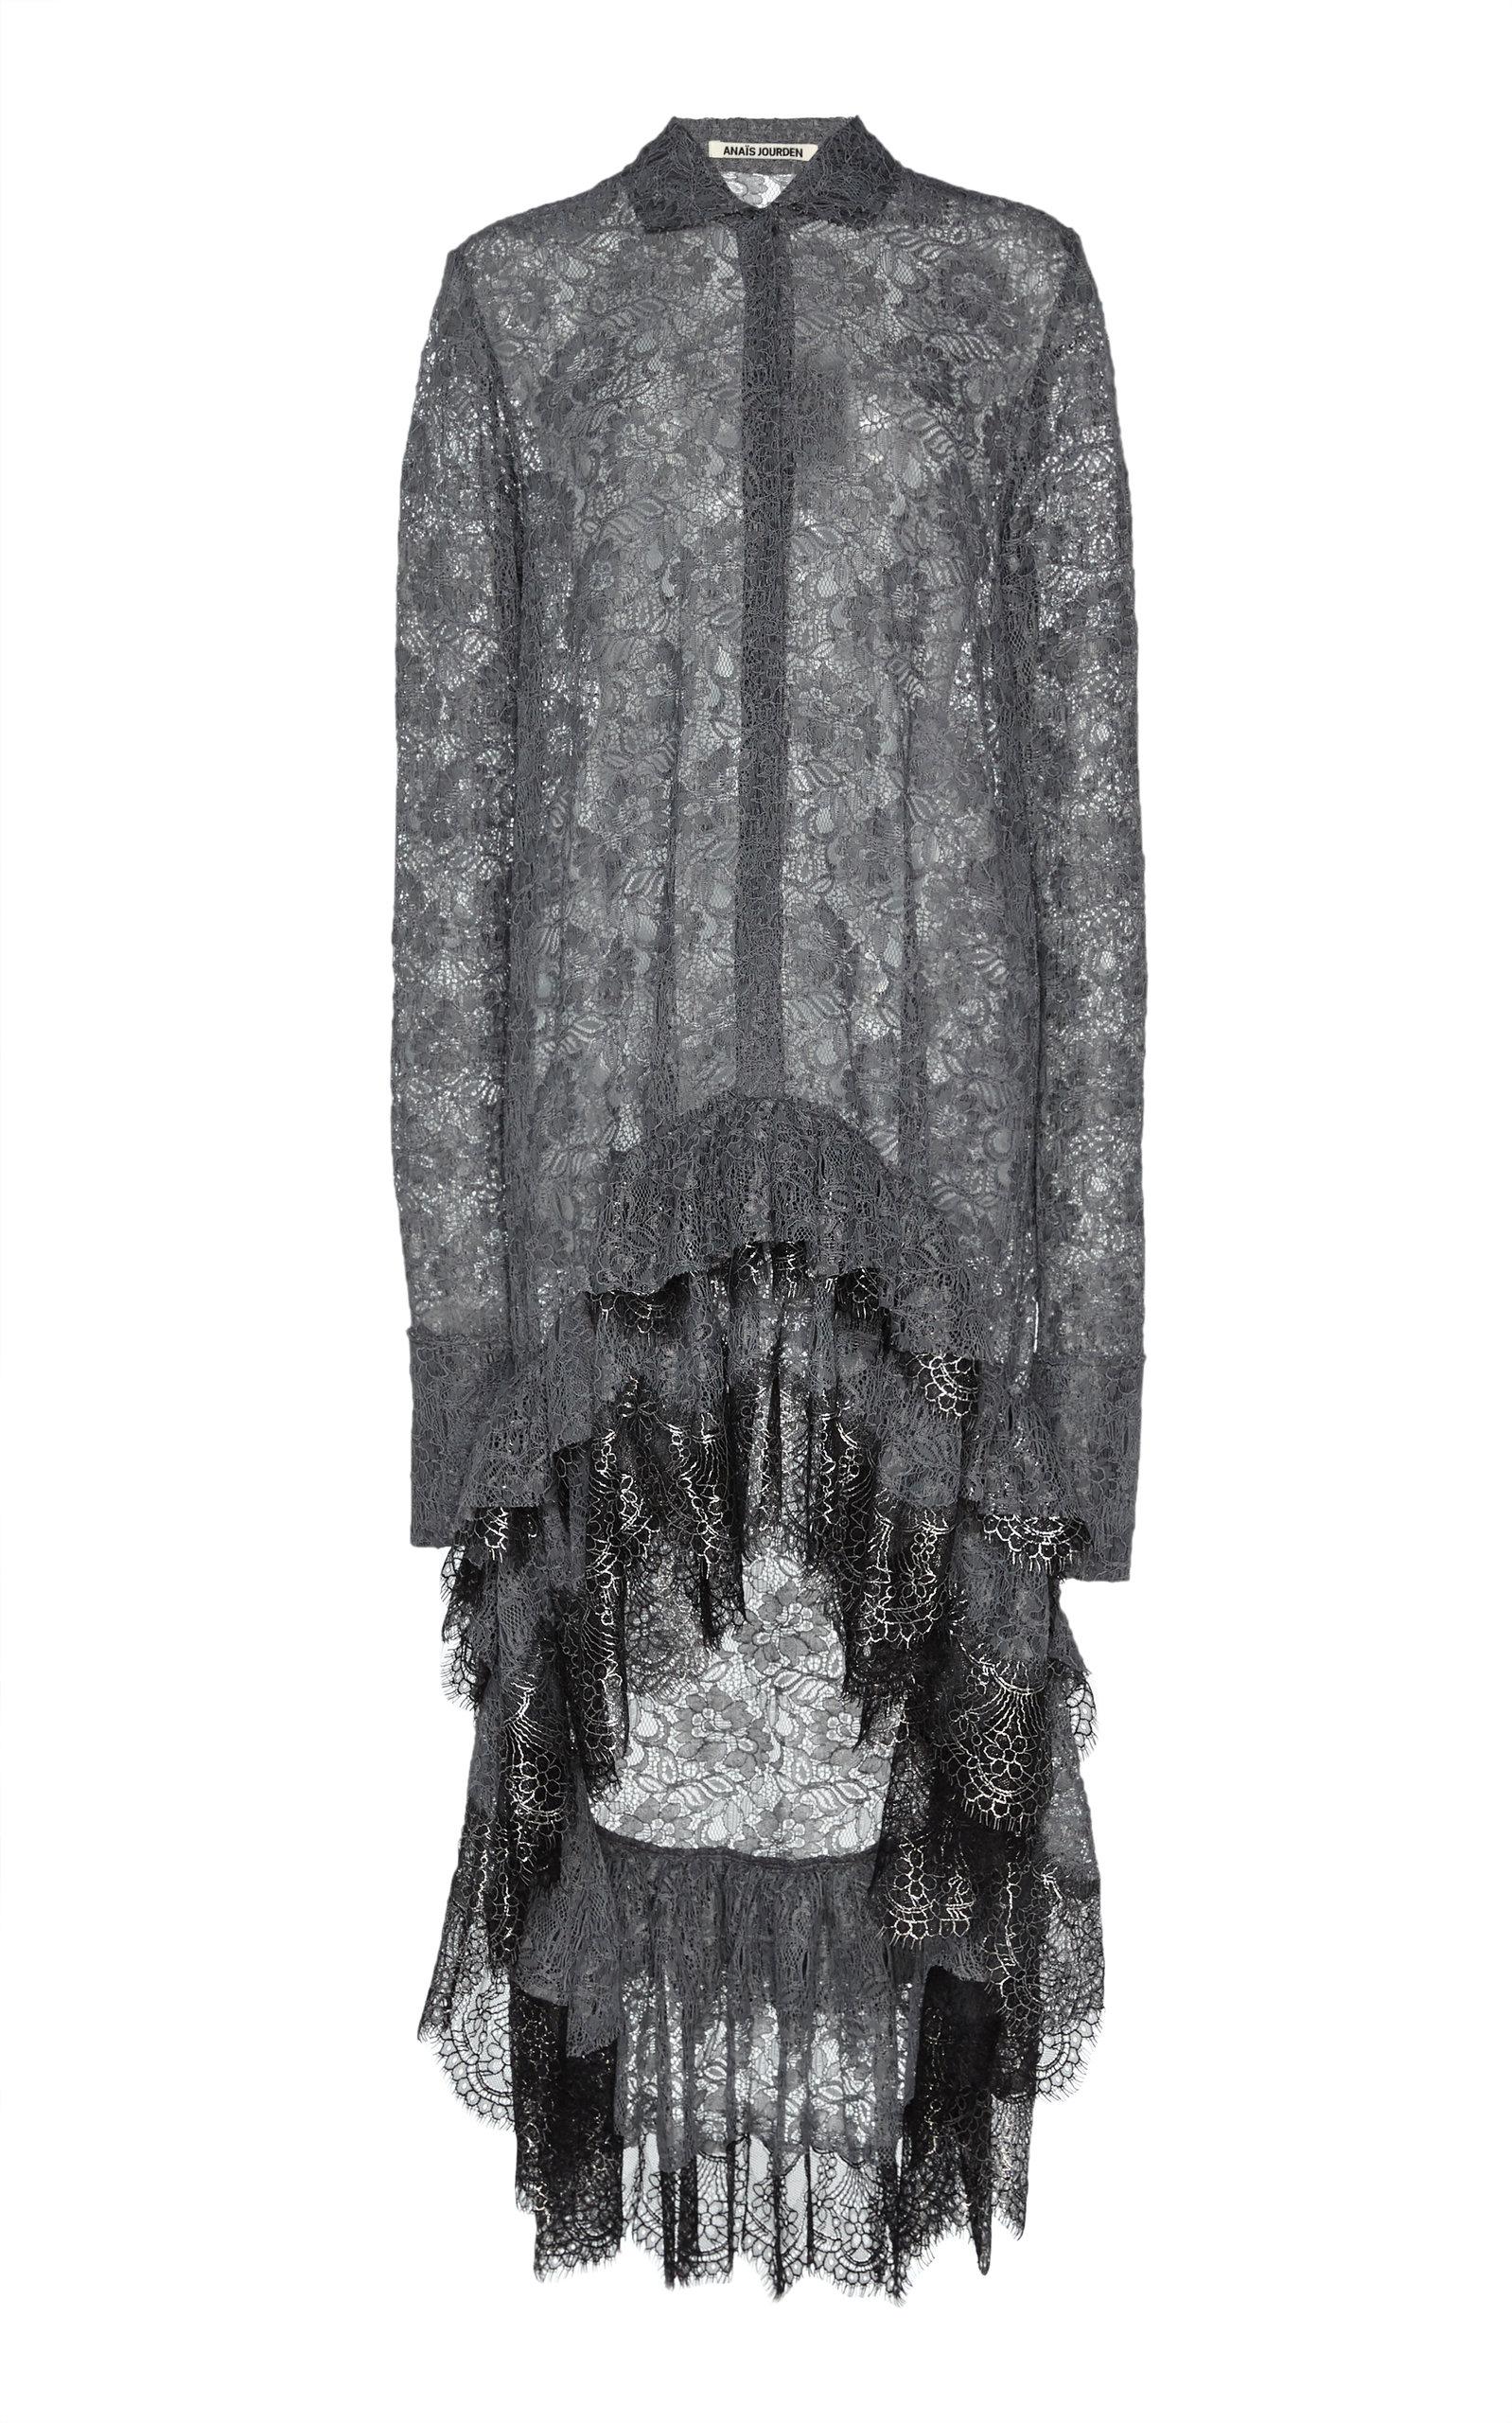 Buy Anaïs Jourden High-Low Ruffled Lace Shirtdress online, shop Anaïs Jourden at the best price